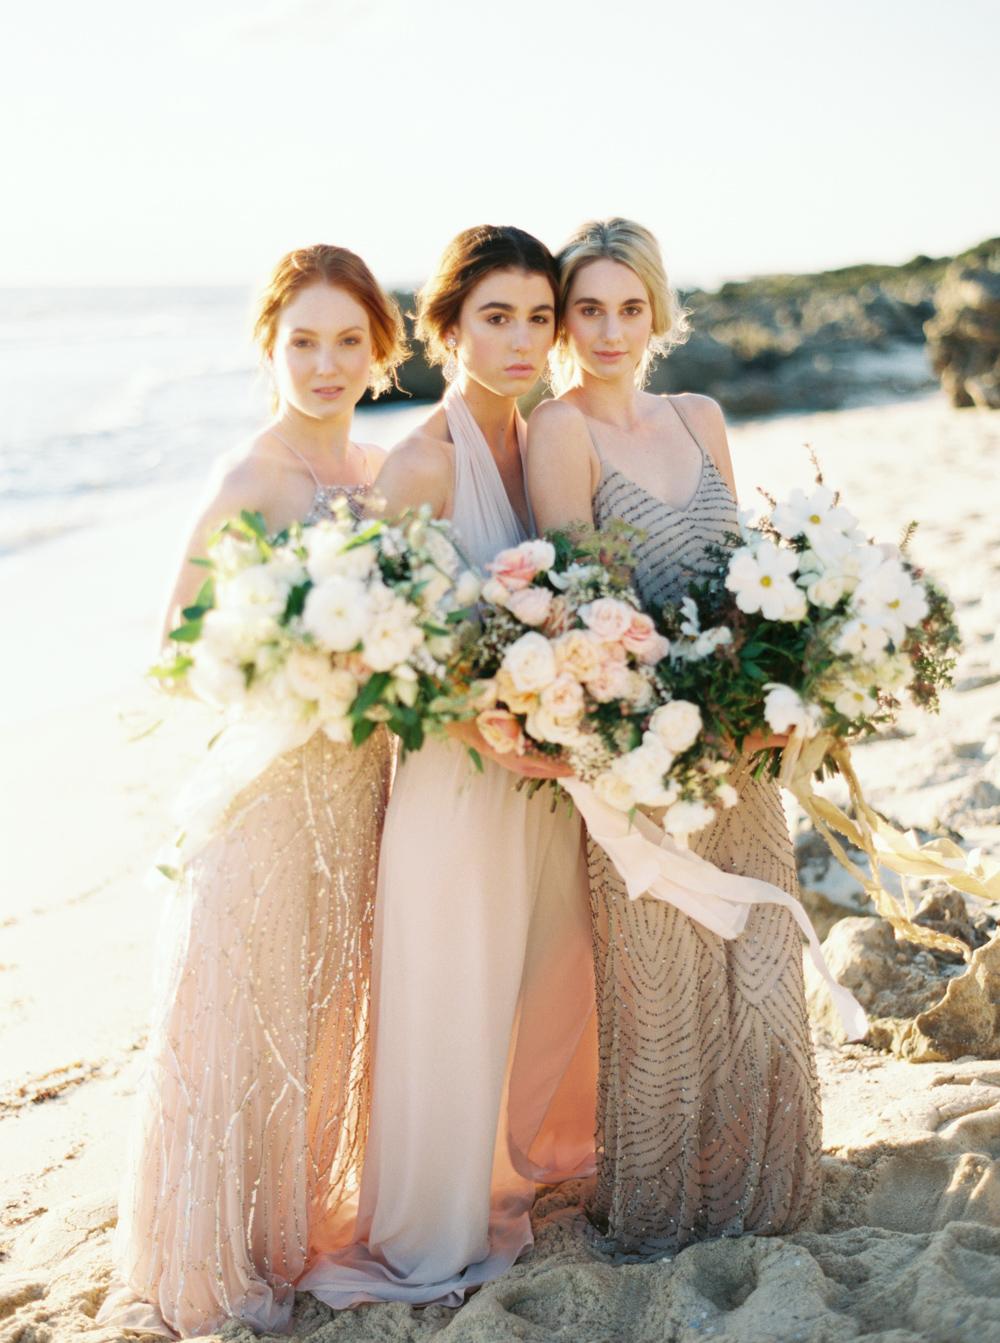 Blush and copper bridesmaids dresses elizabeth anne designs the blush and copper bridesmaids dresses elizabeth anne designs the wedding blog ombrellifo Choice Image